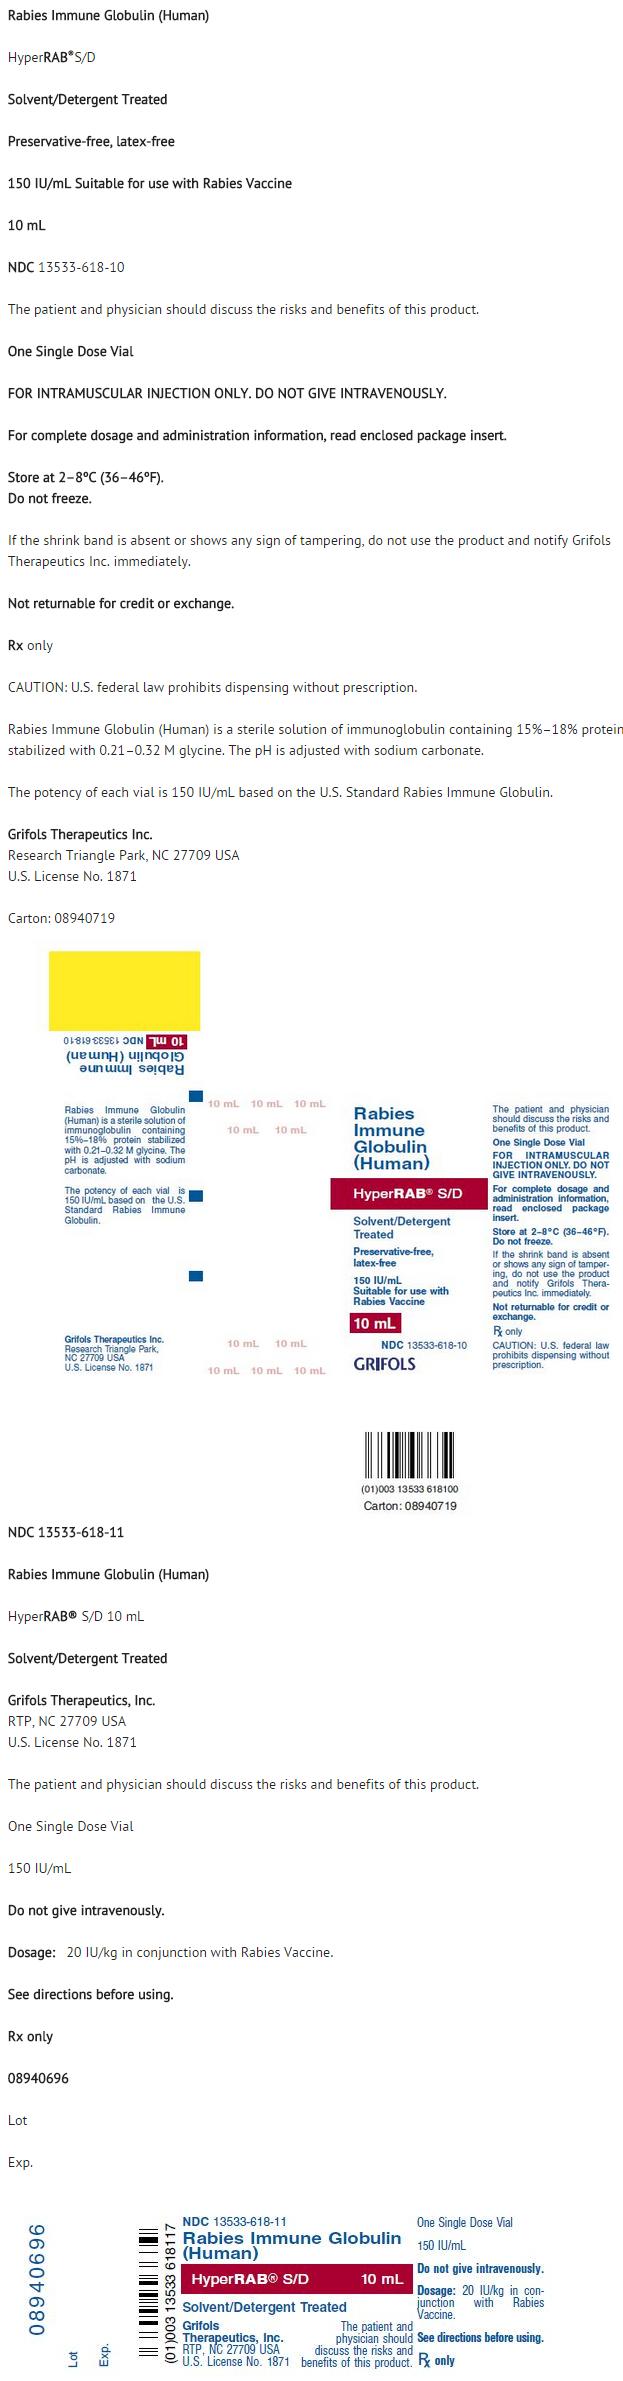 Human rabies virus immune globulin - wikidoc